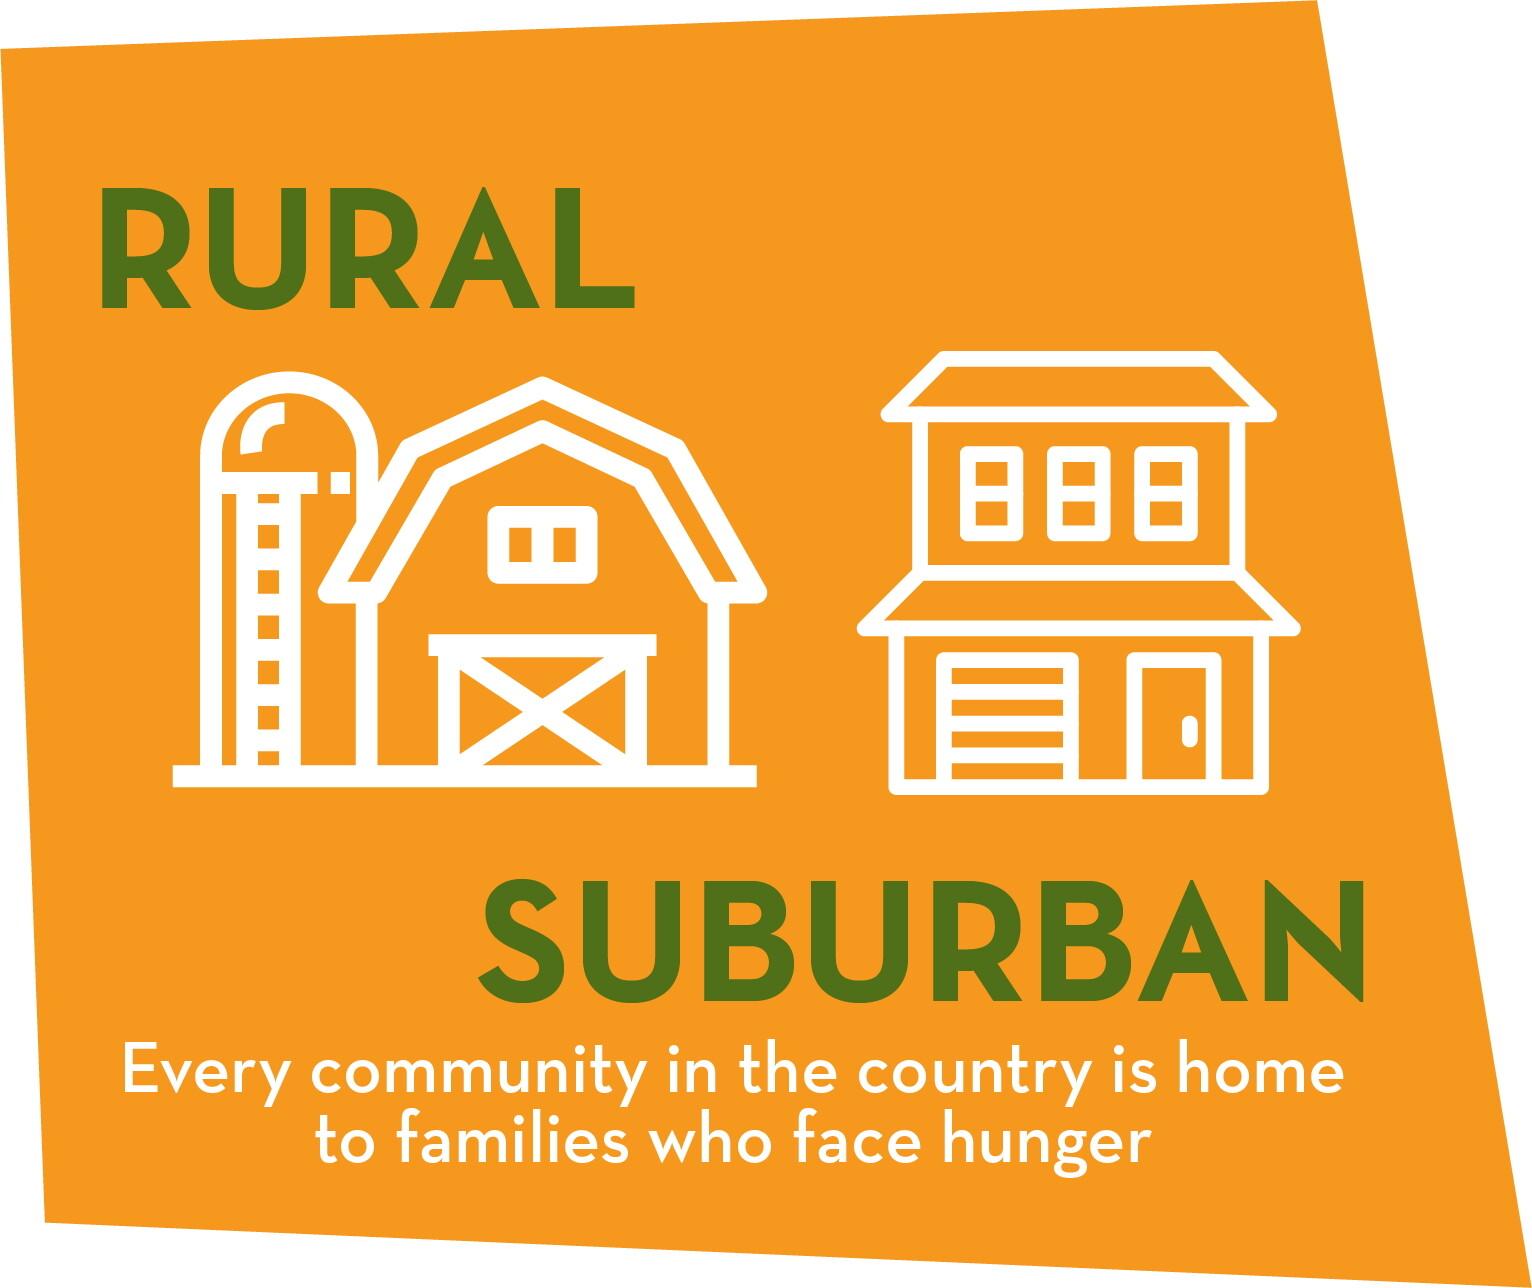 Rural Suburban